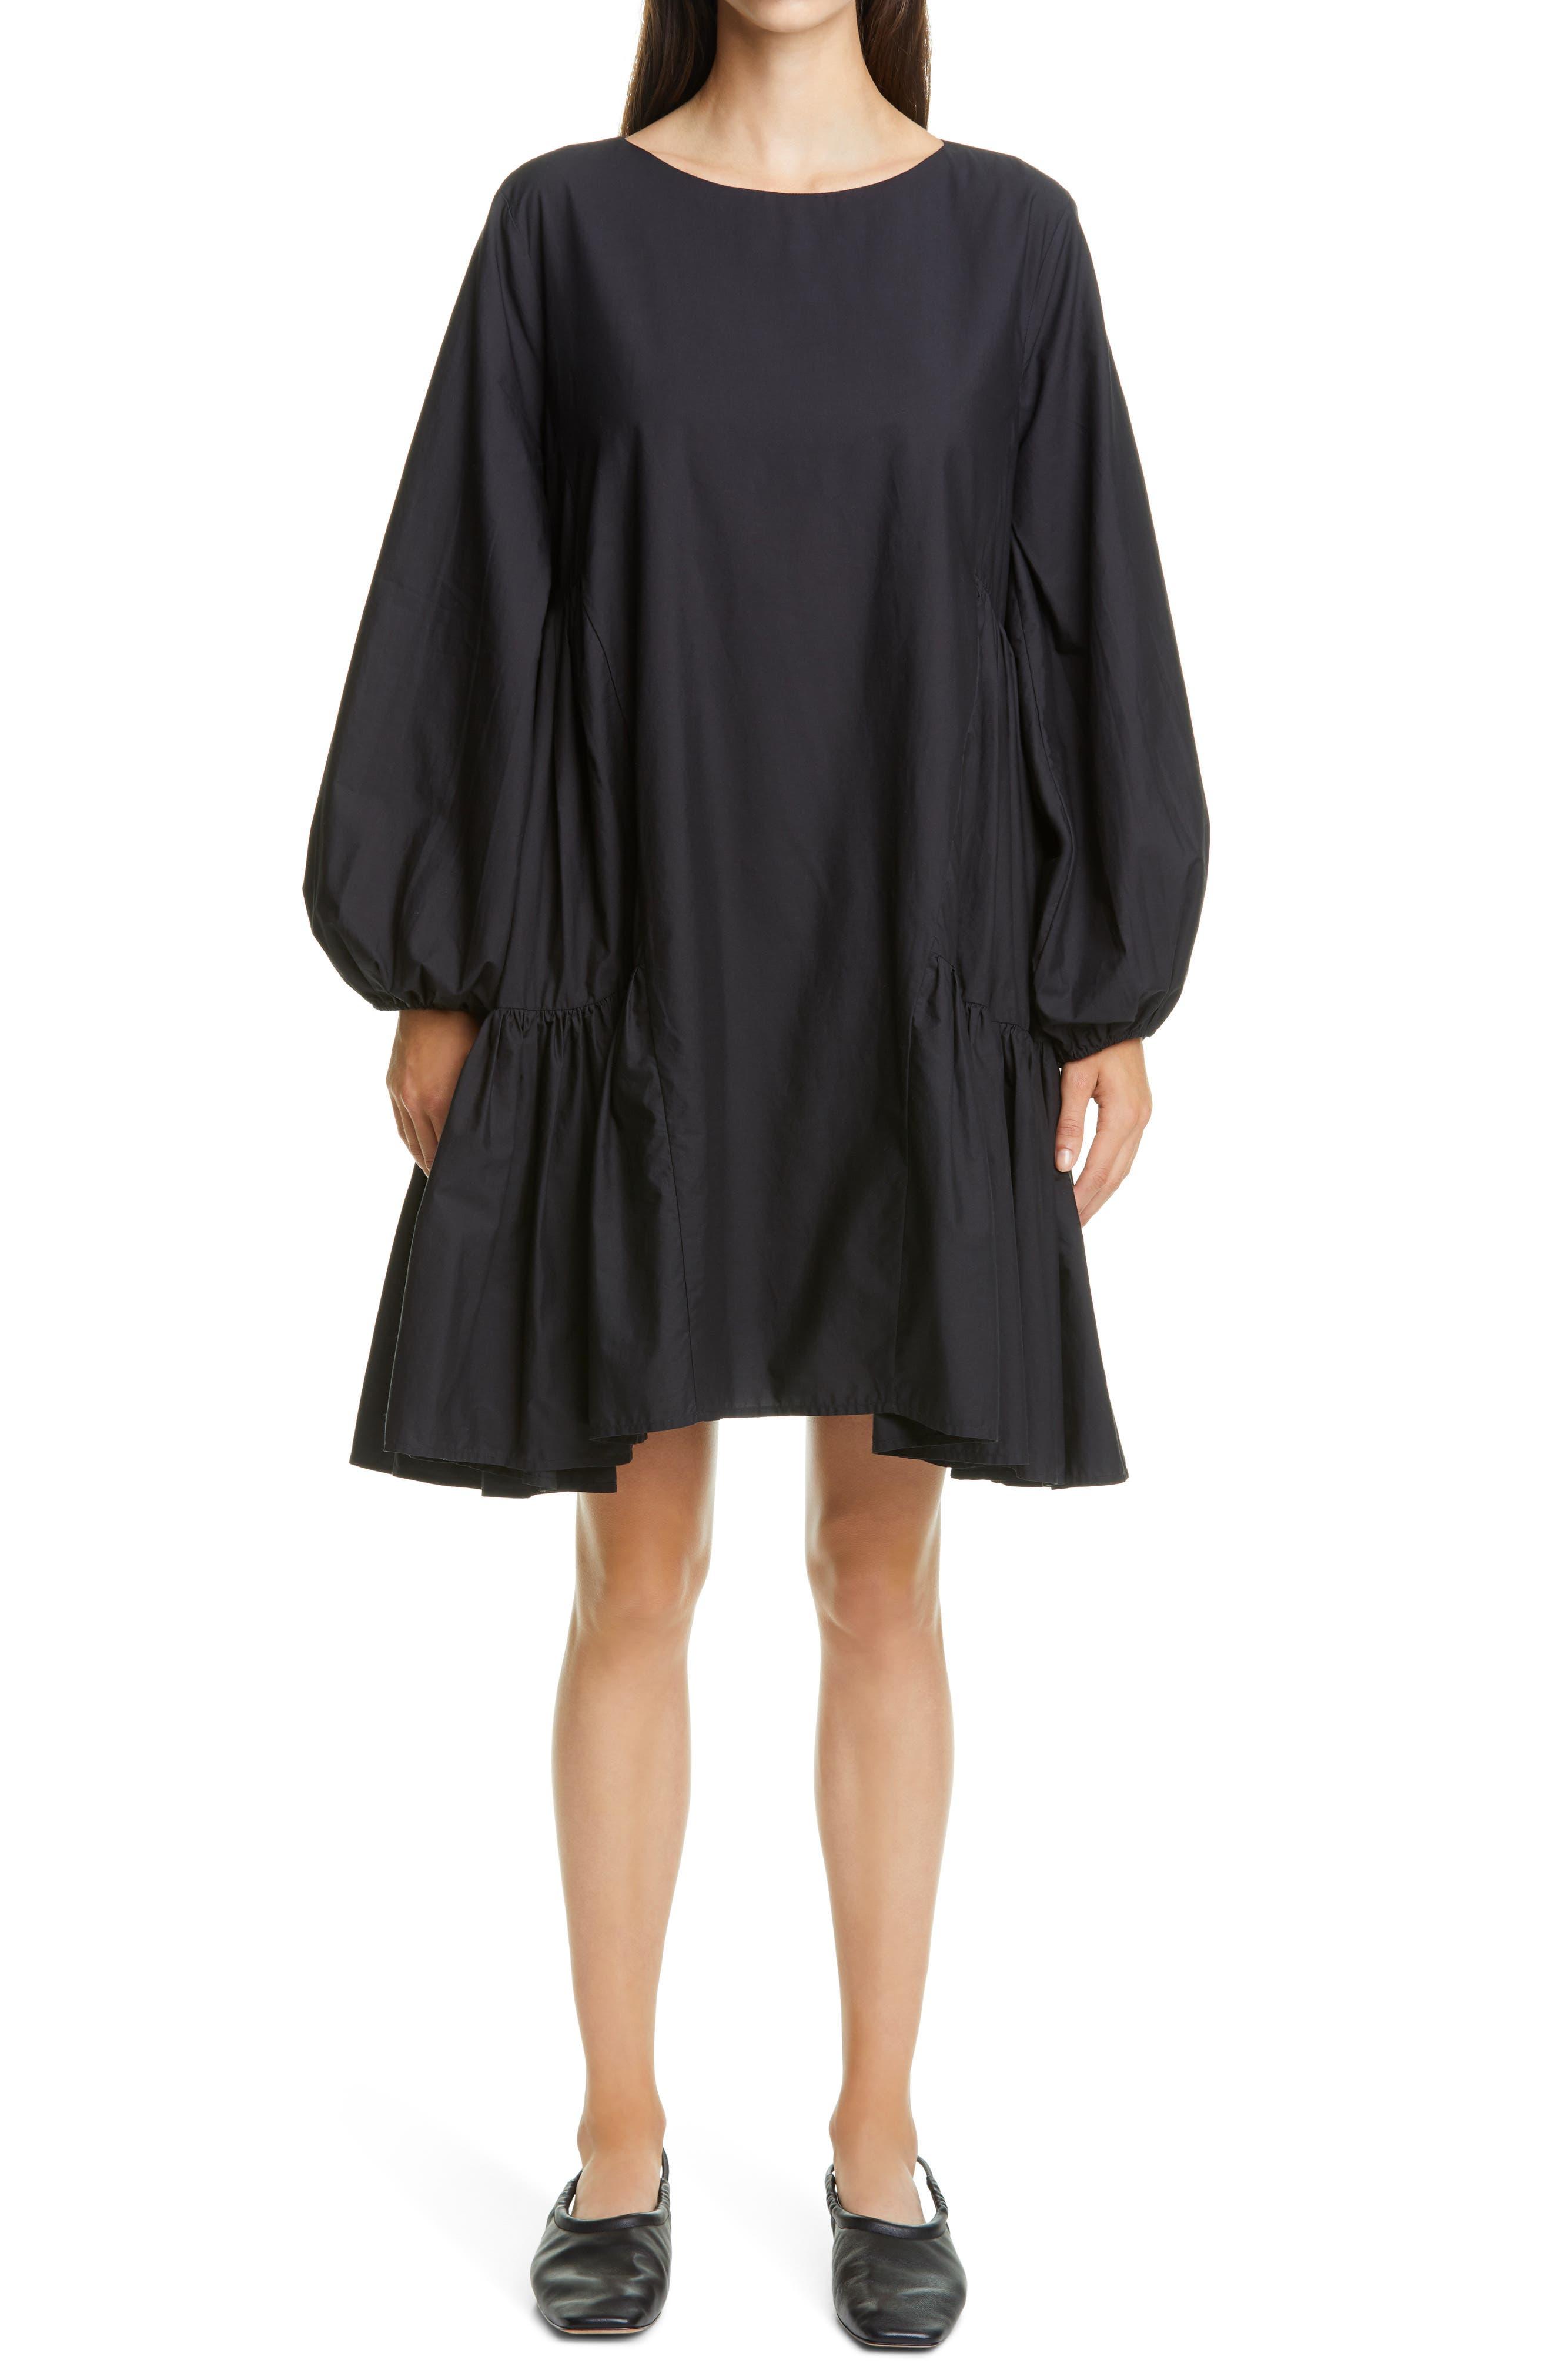 Byward Long Sleeve Pima Cotton Dress